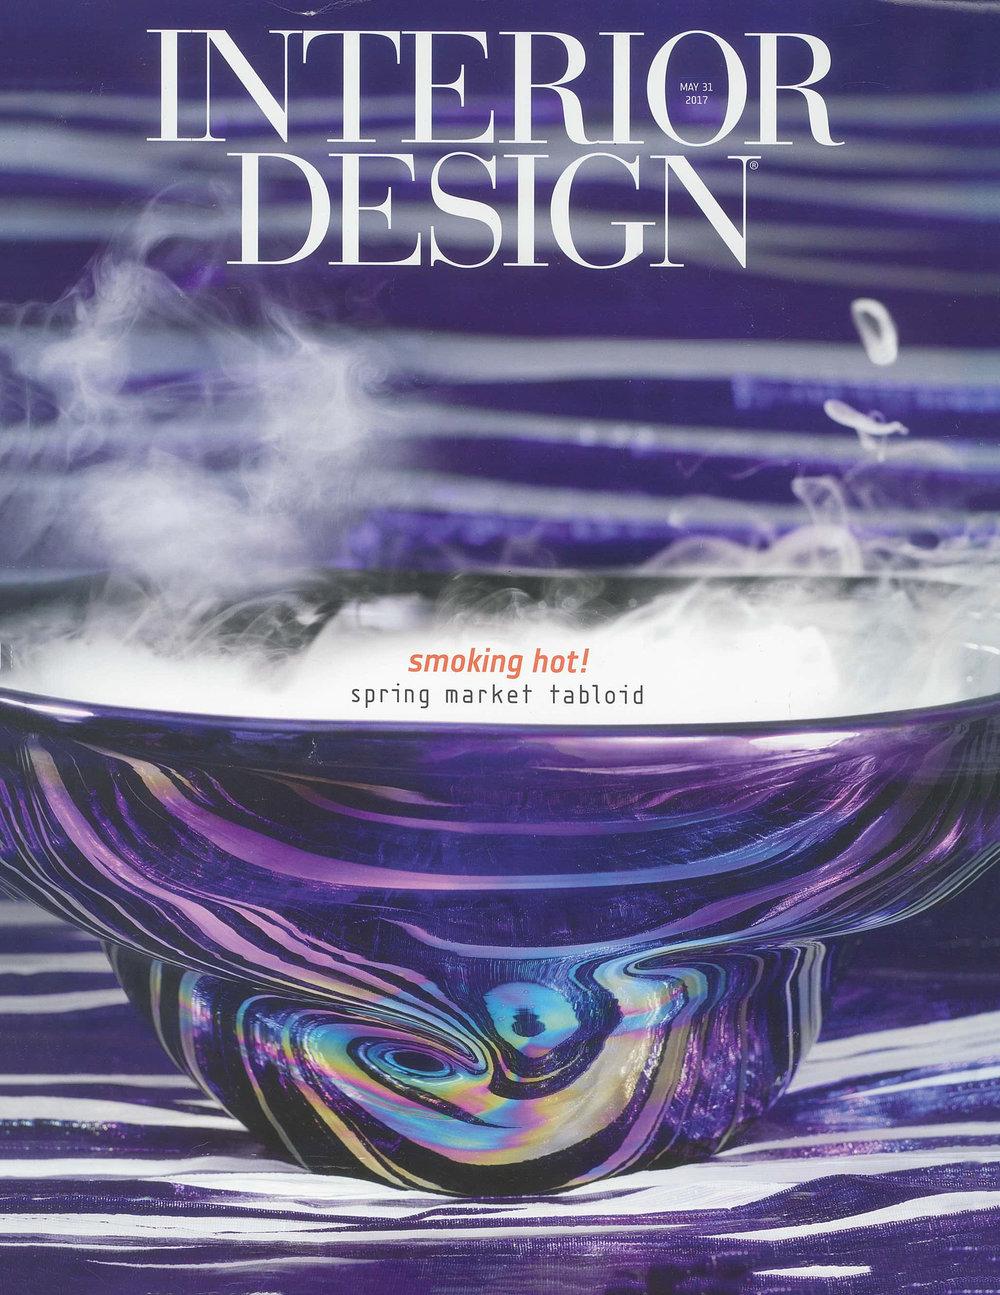 Interior+Design-May+31,+2017.jpg